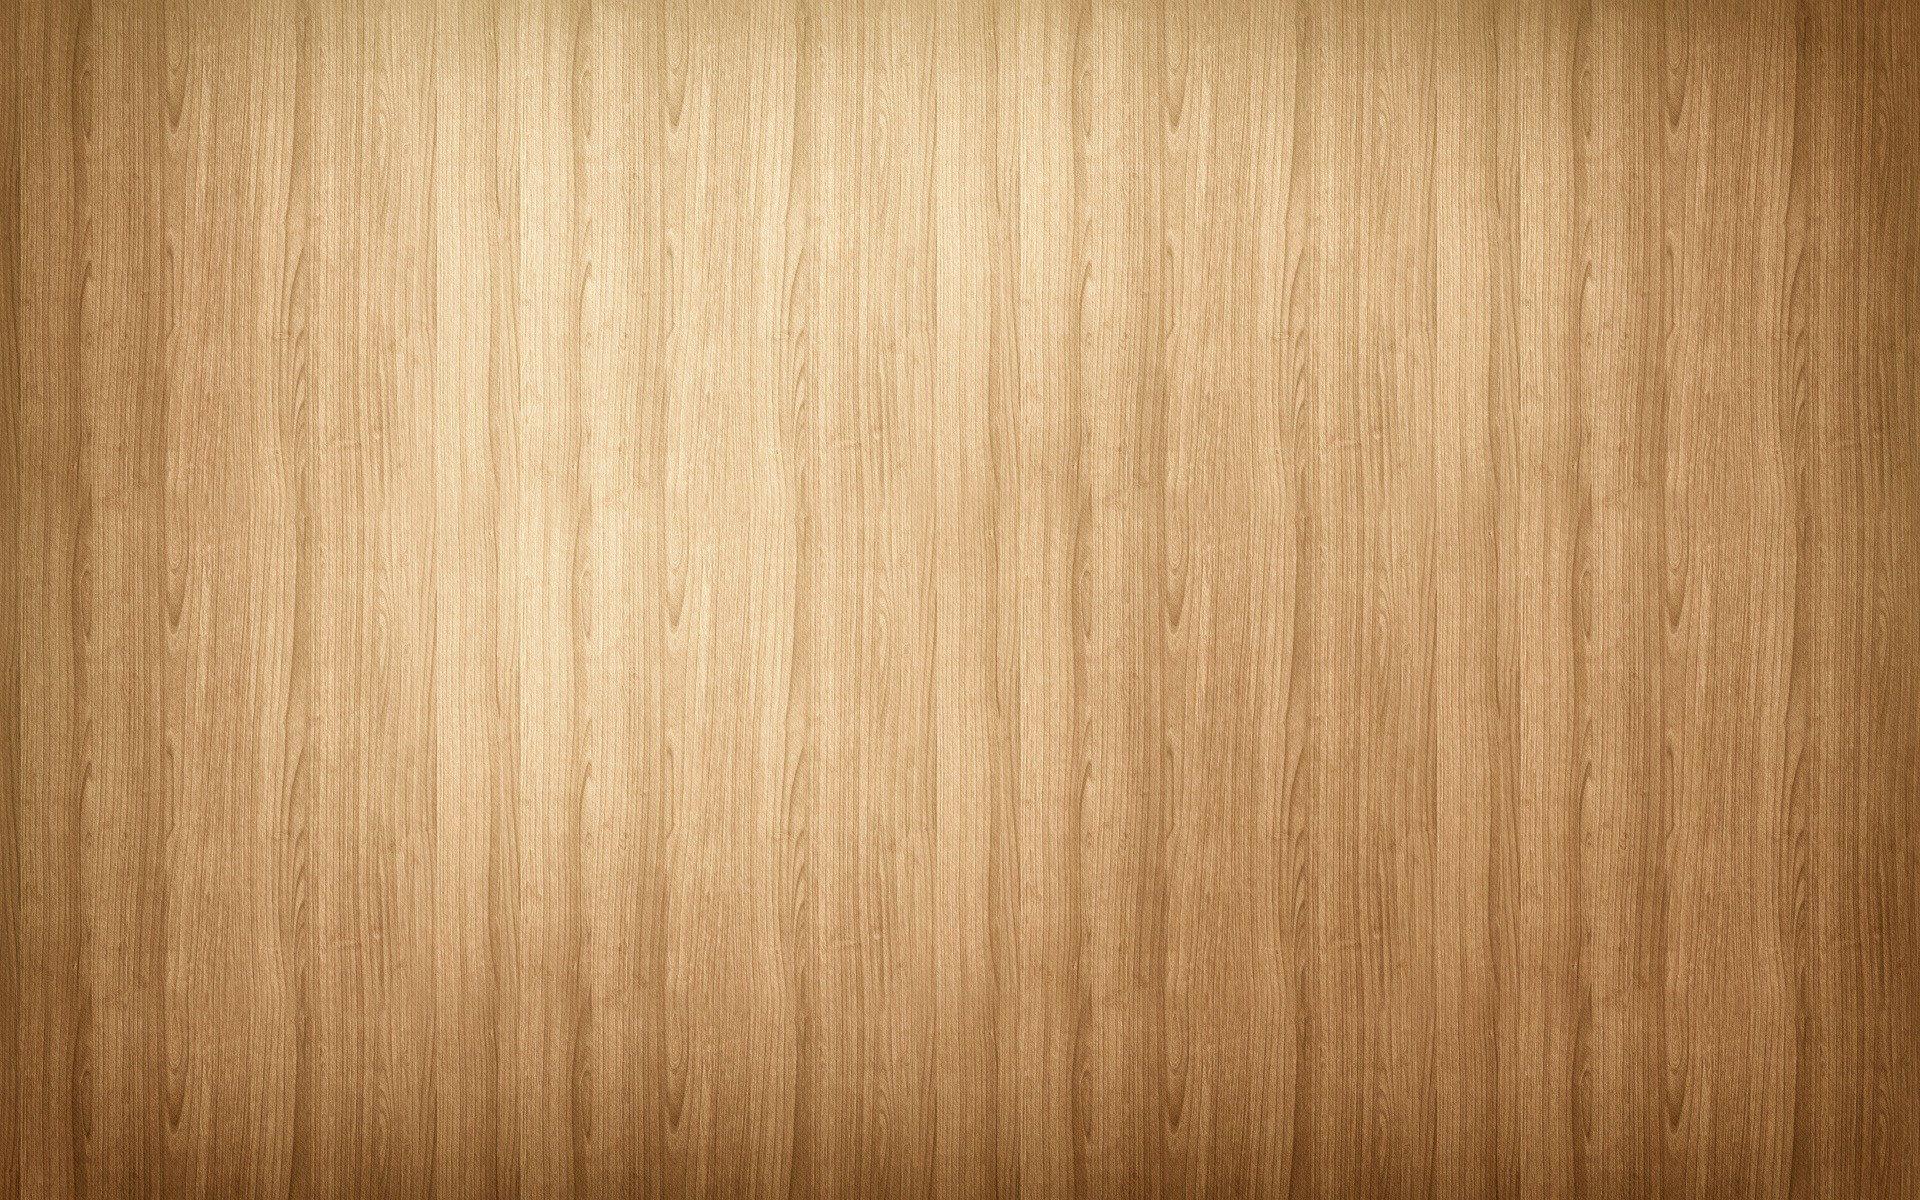 Light Wood Floor Background. light wood wallpaper background hd  ololoshenka Pinterest